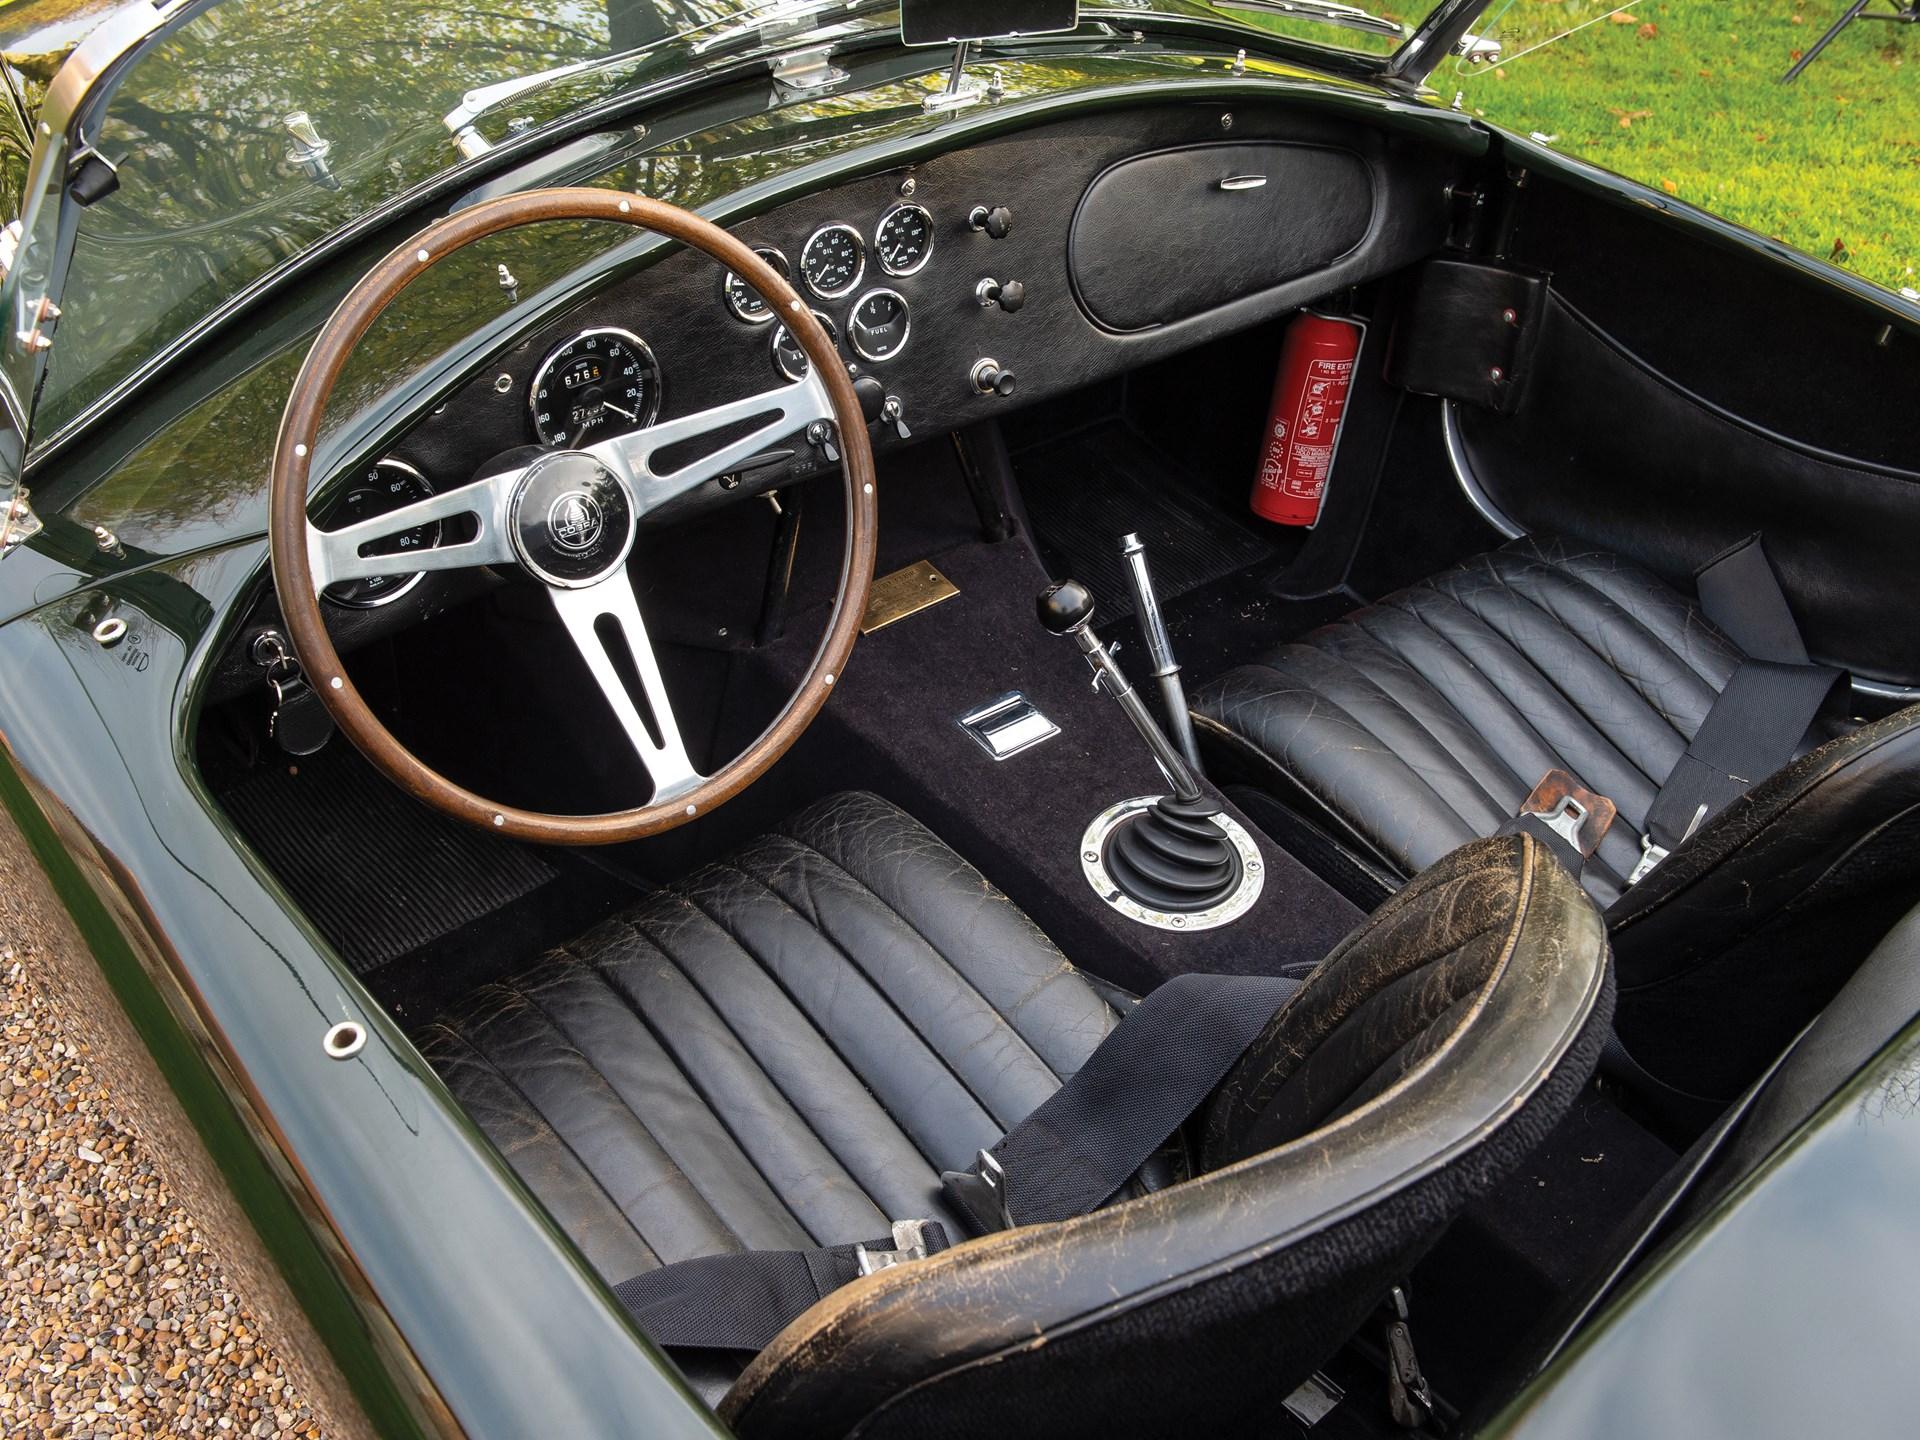 1966 Shelby 427 Cobra